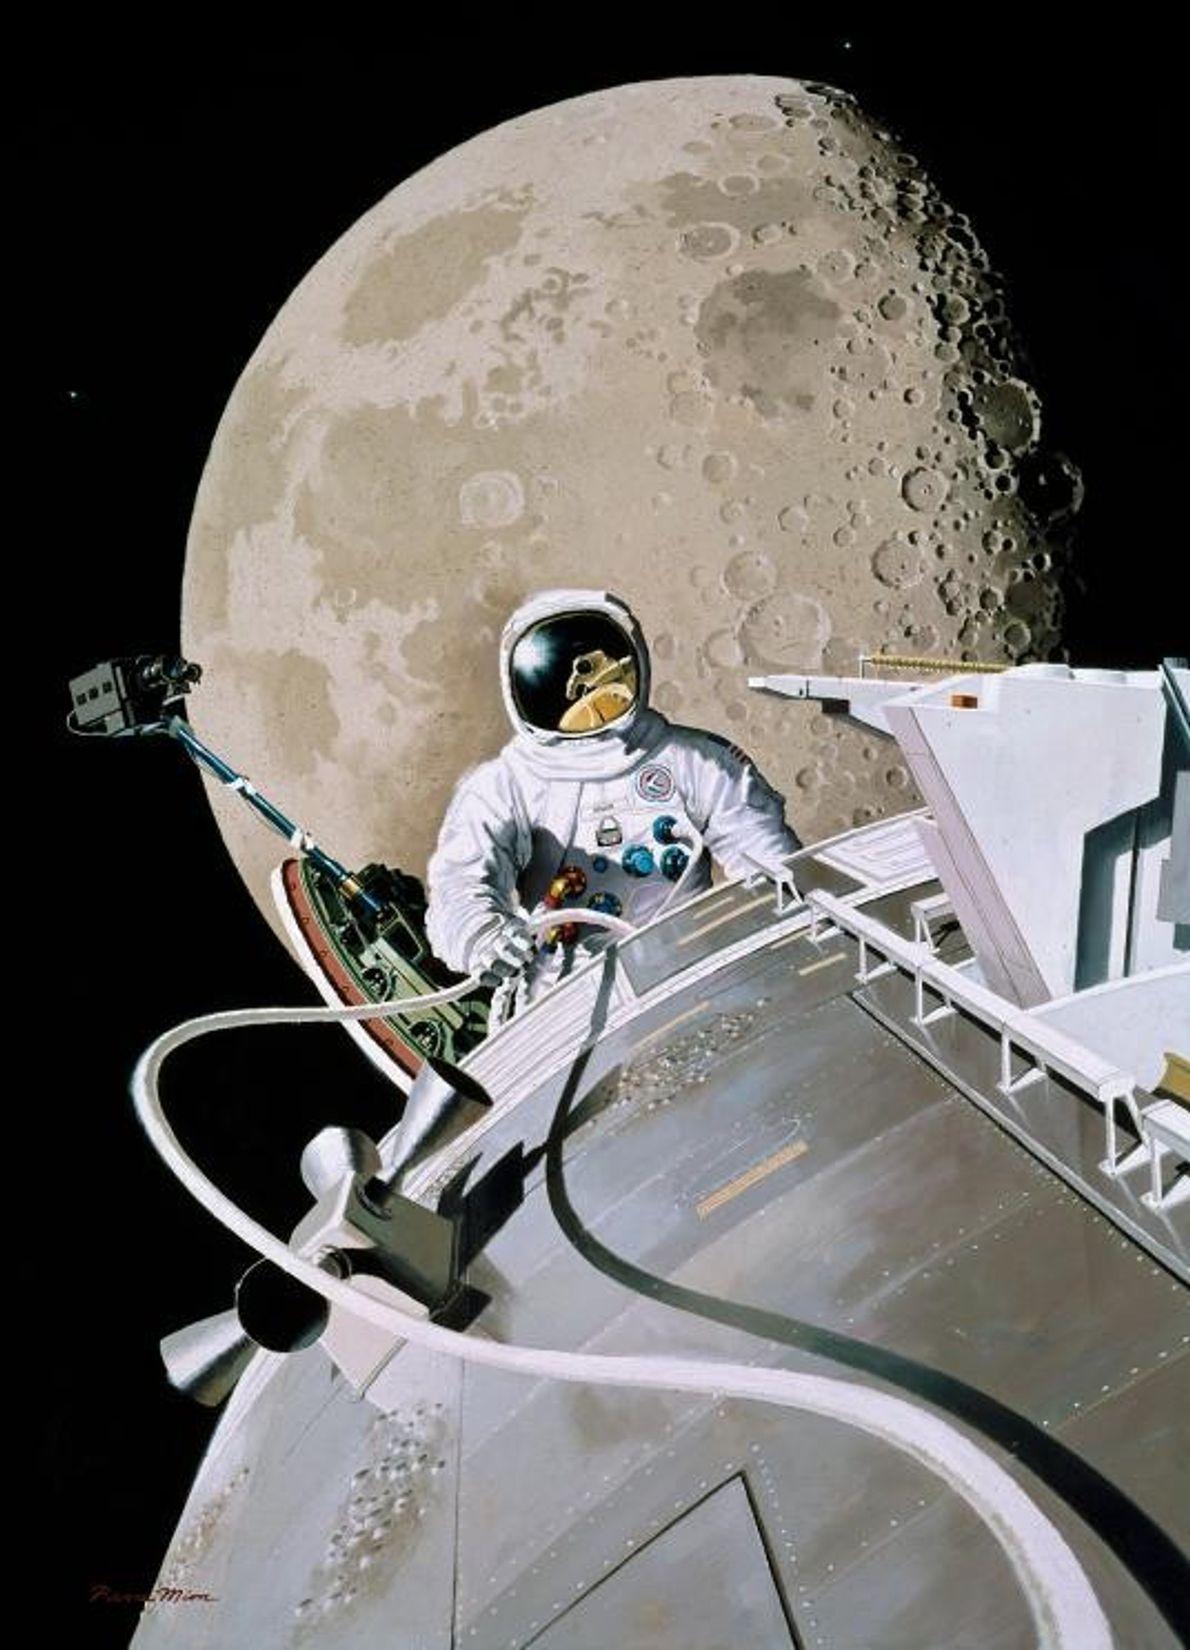 Al Worden's Space Walk, February 1972